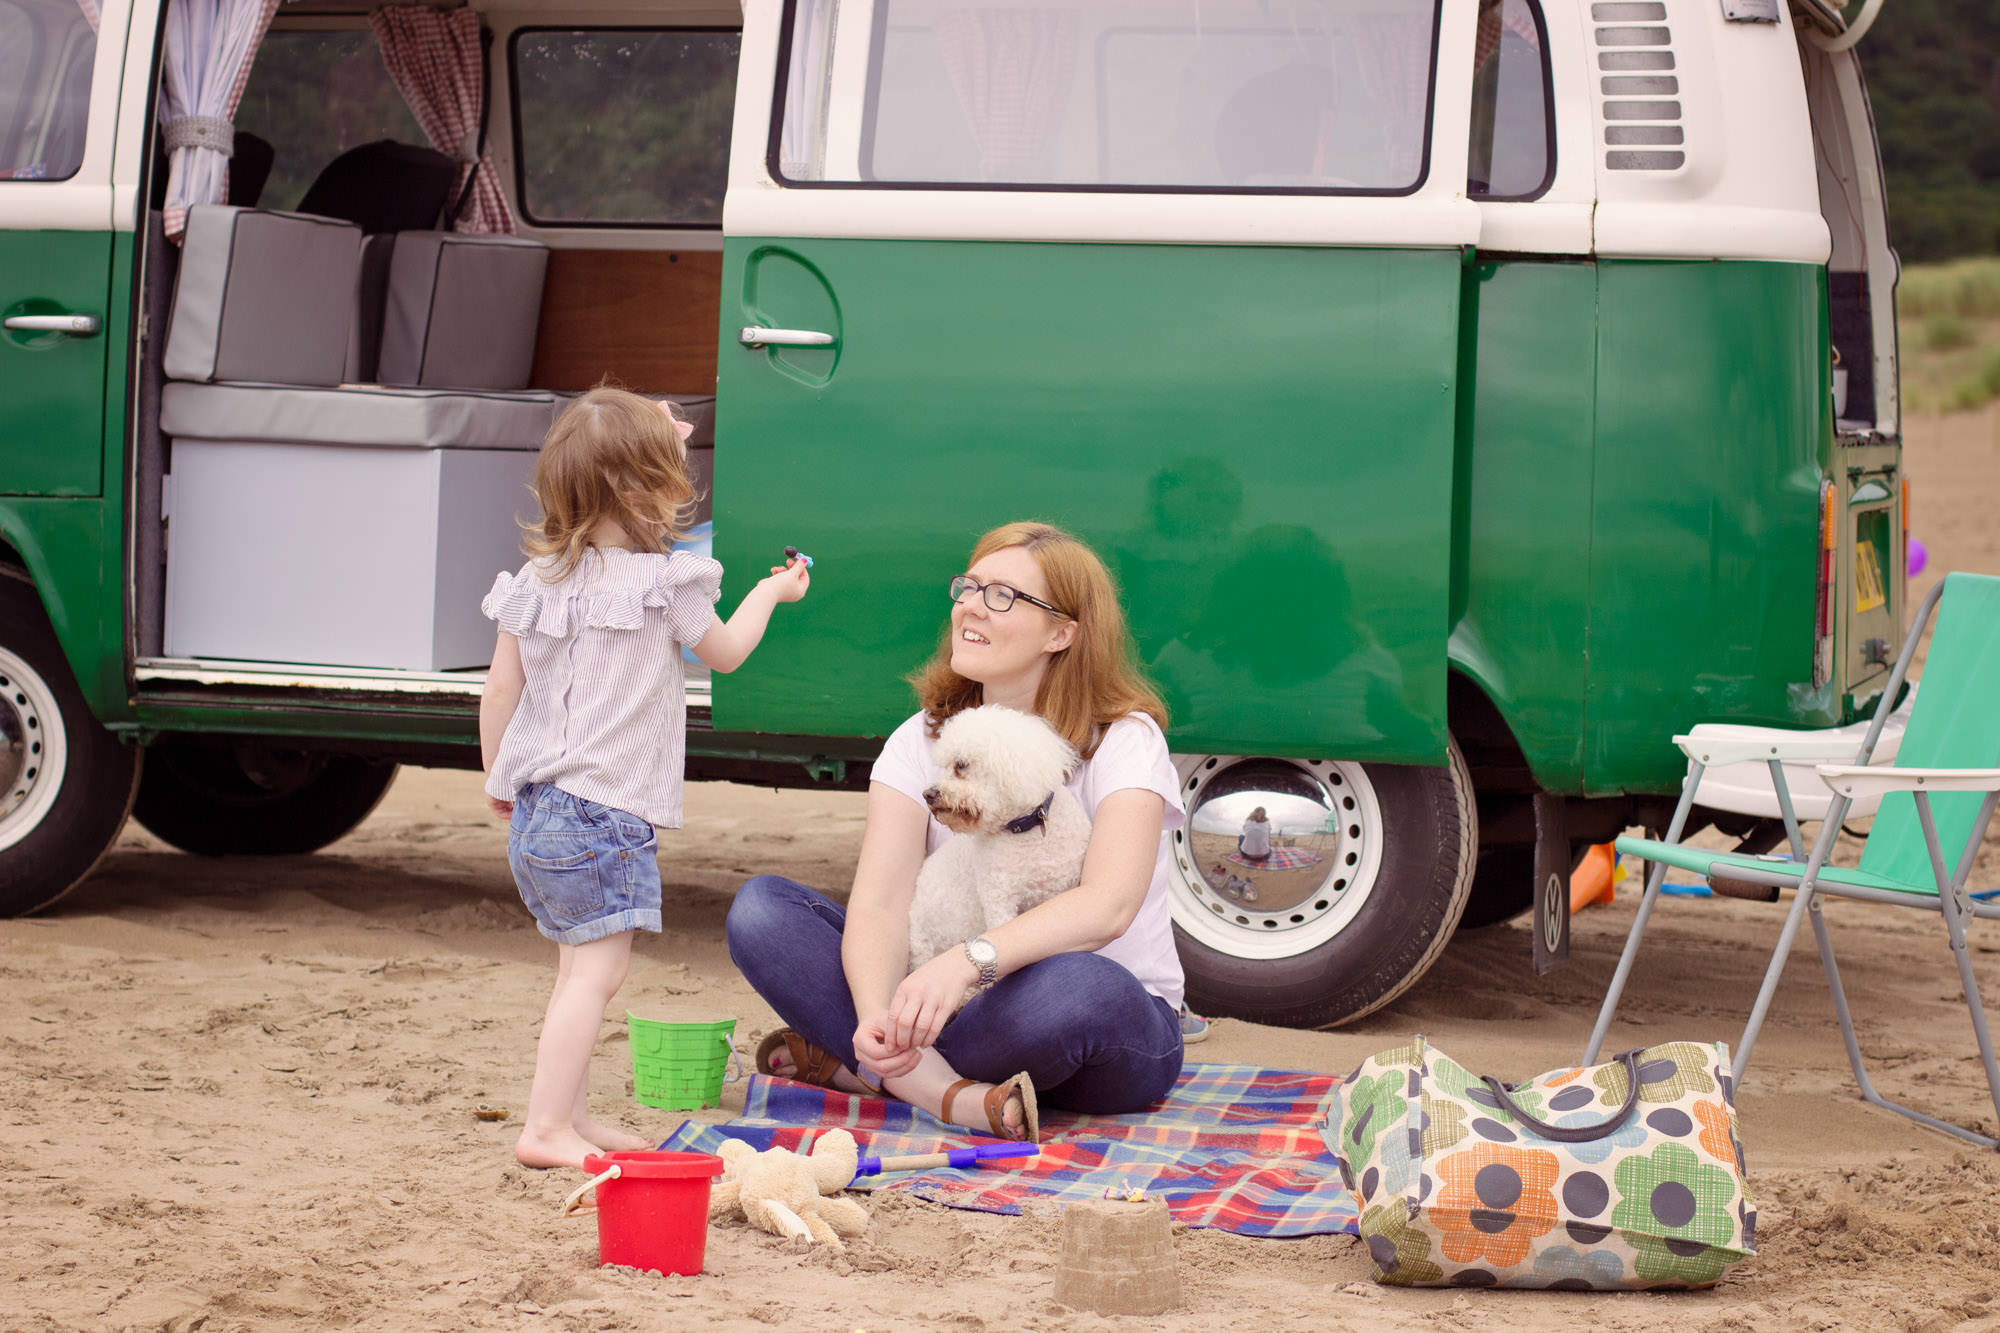 family photo session at Downhill beach Mel Hudson Family Photography